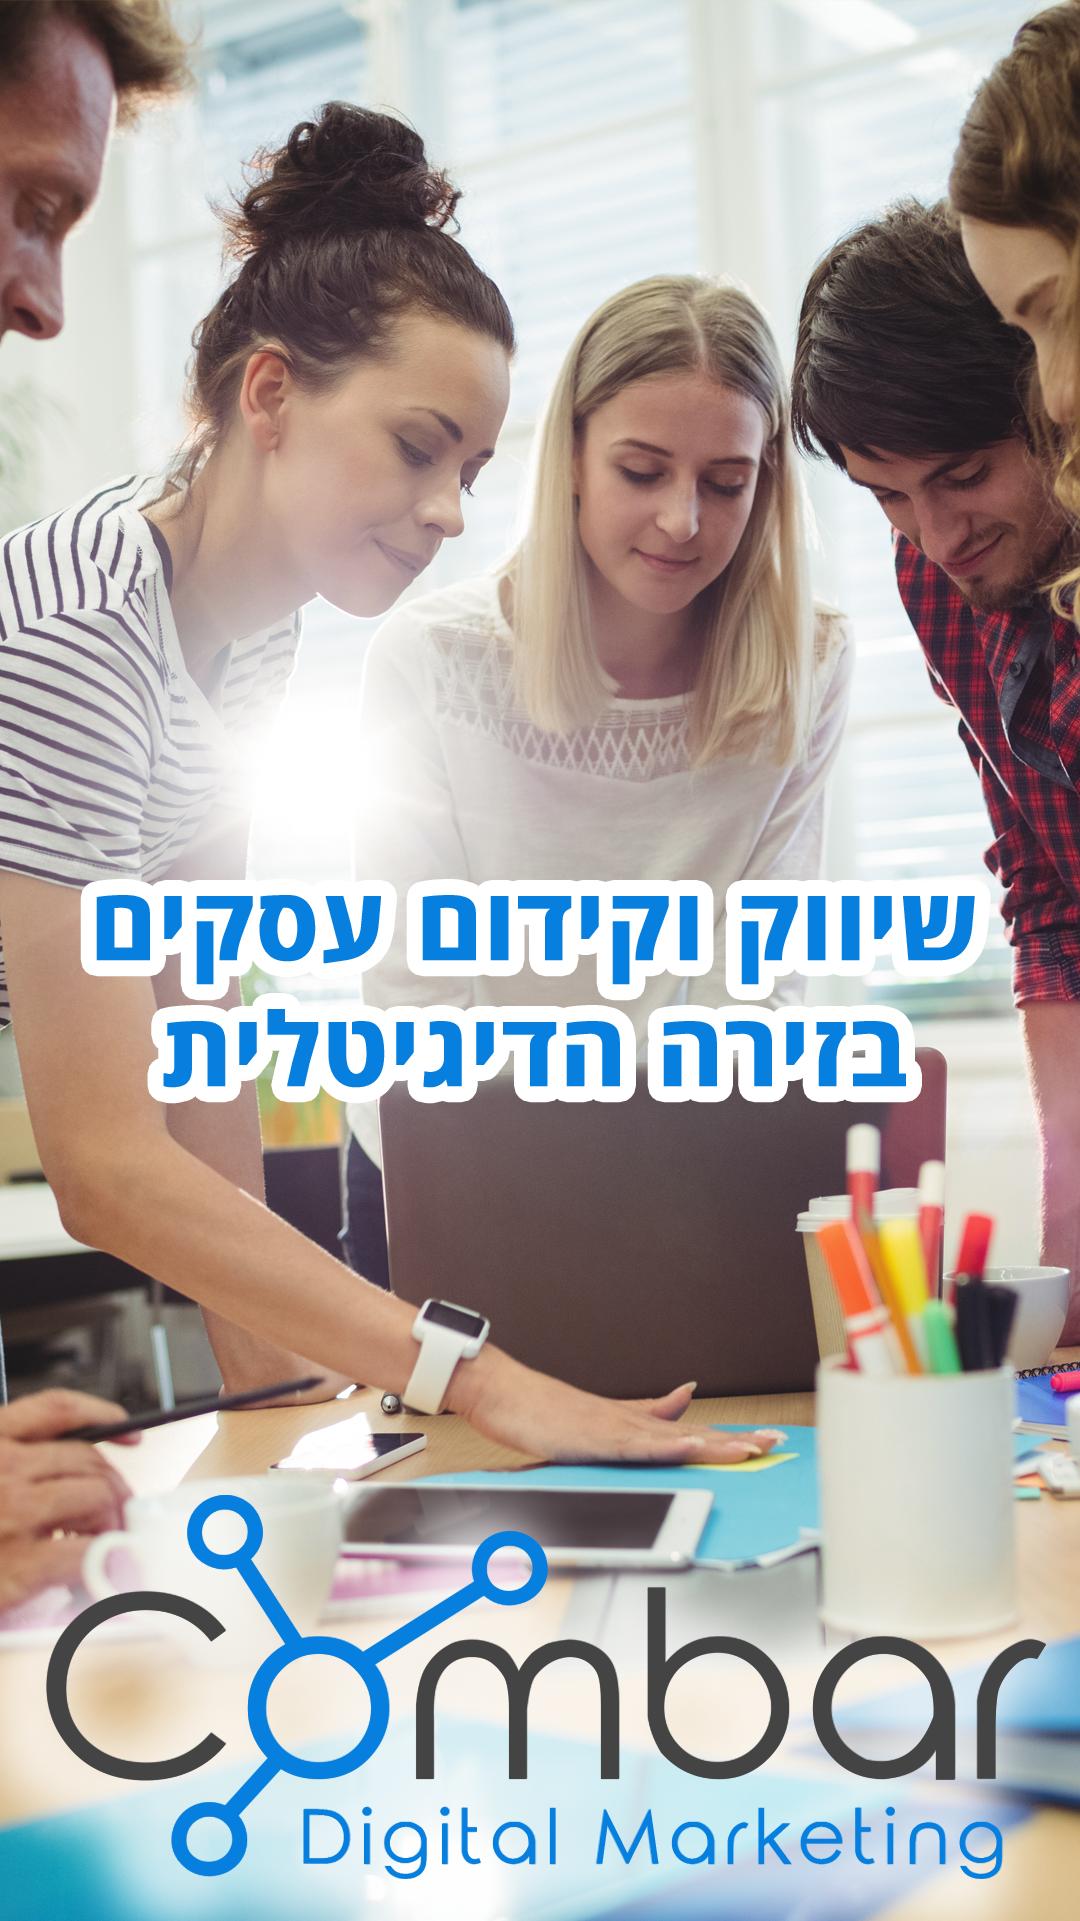 Combar קידום אתרים ושרותי שיווק דיגיטלי לעסקים